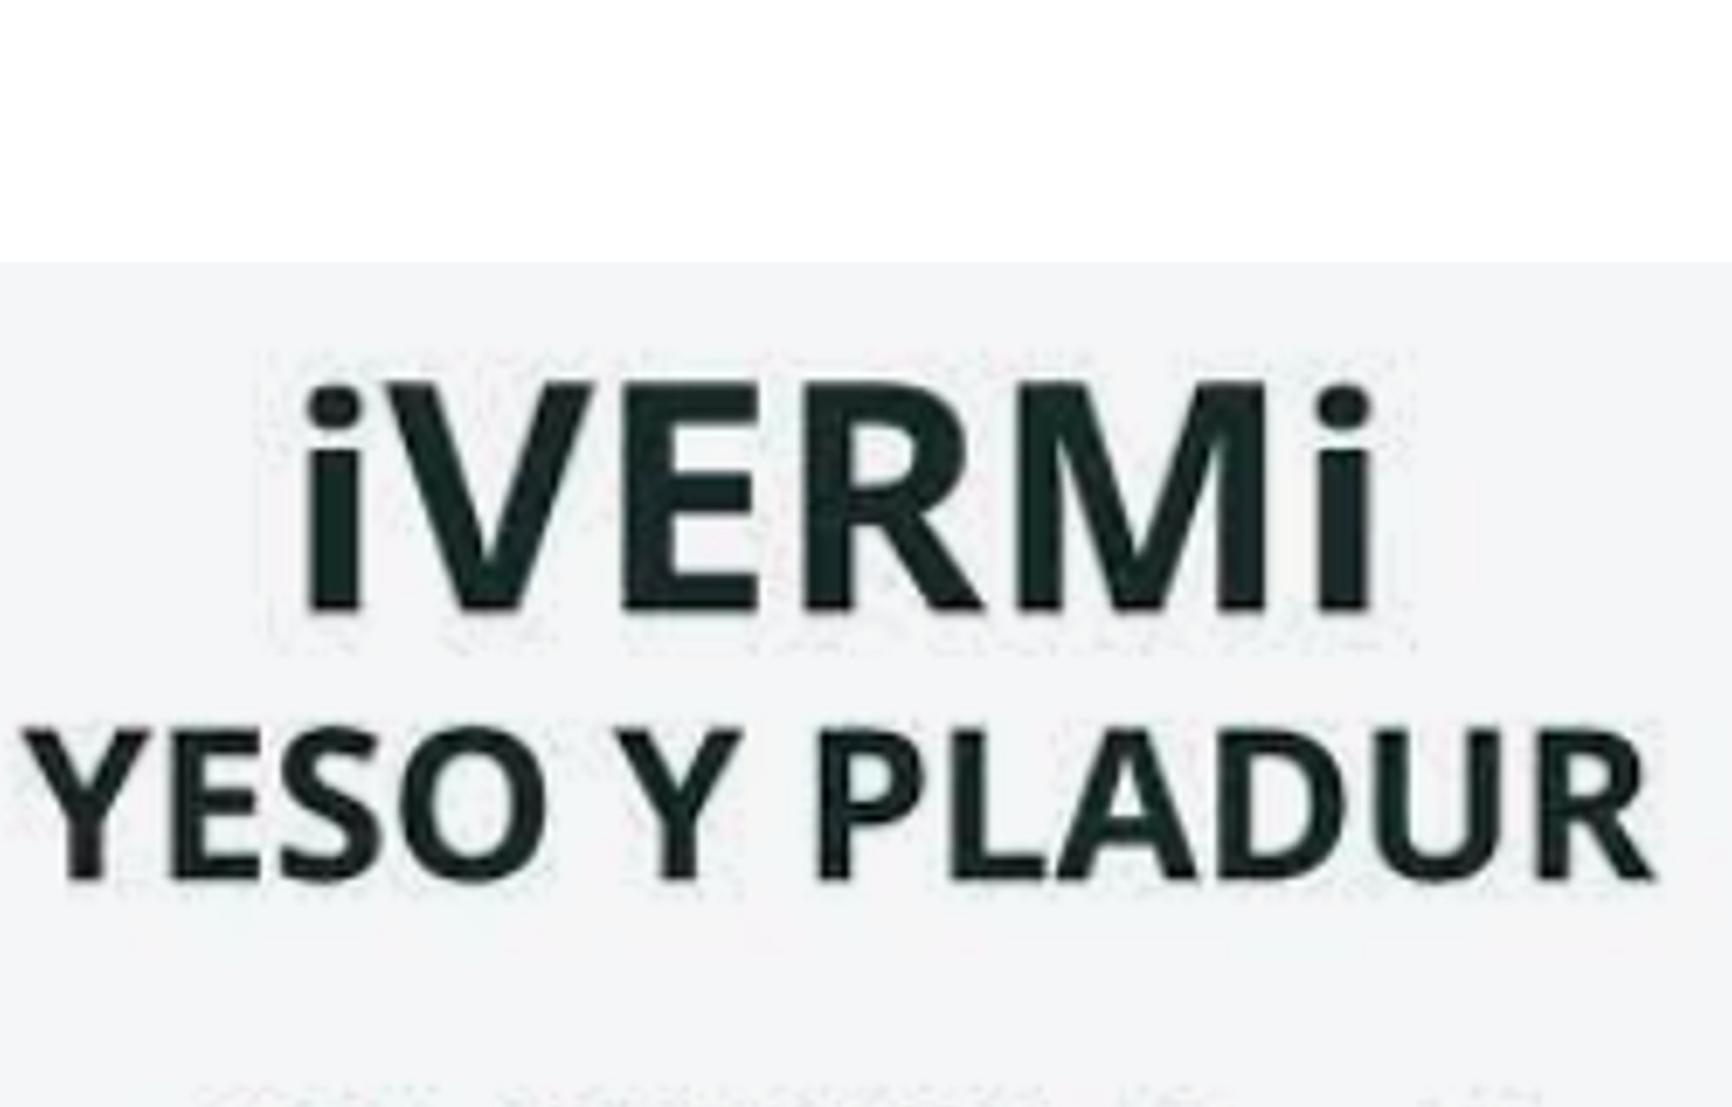 iVERMi Yeso y Pladur